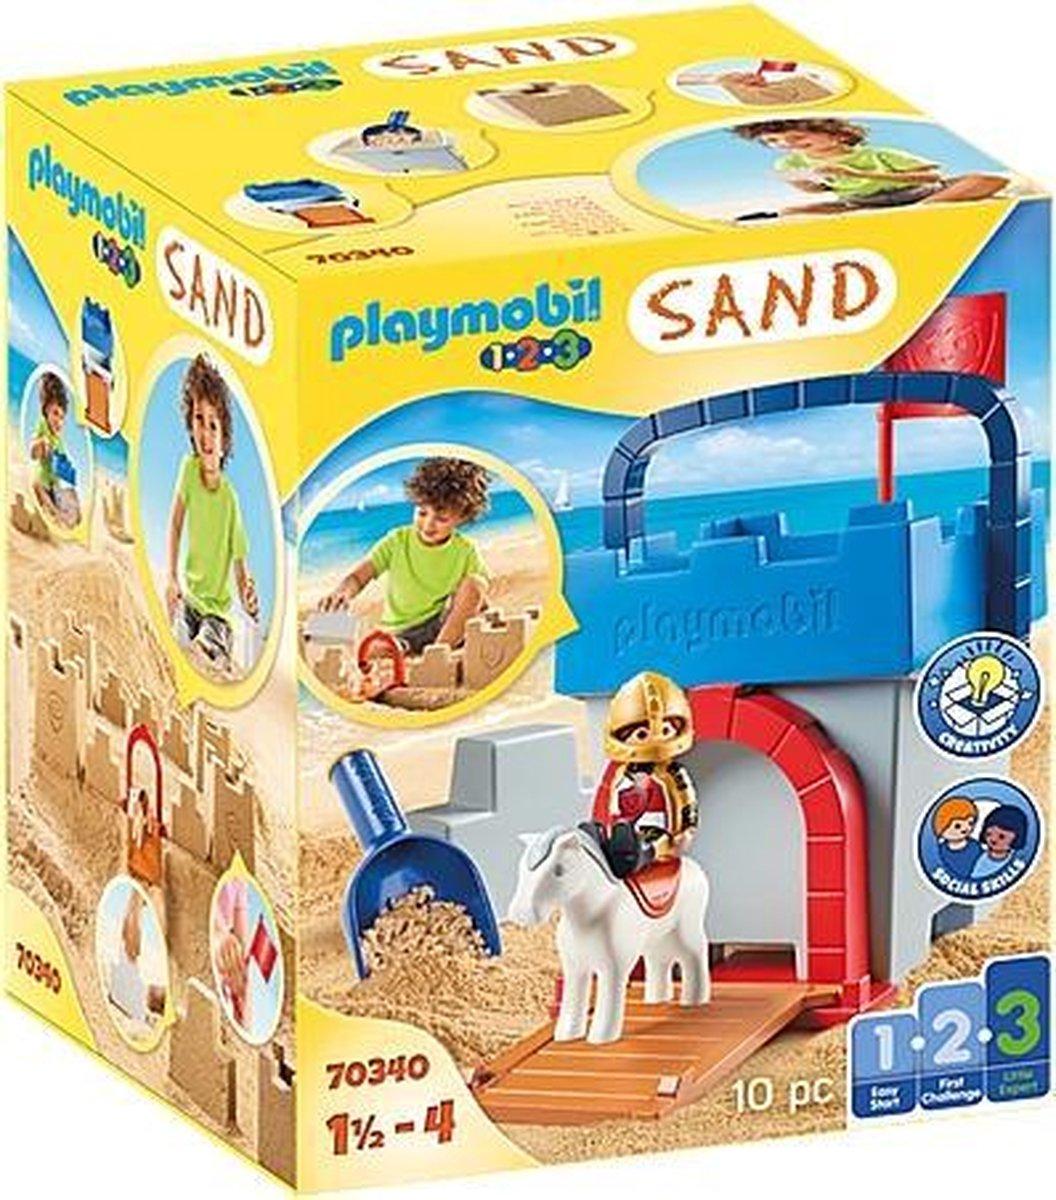 PLAYMOBIL 1.2.3 SAND Zandkasteel - 70340